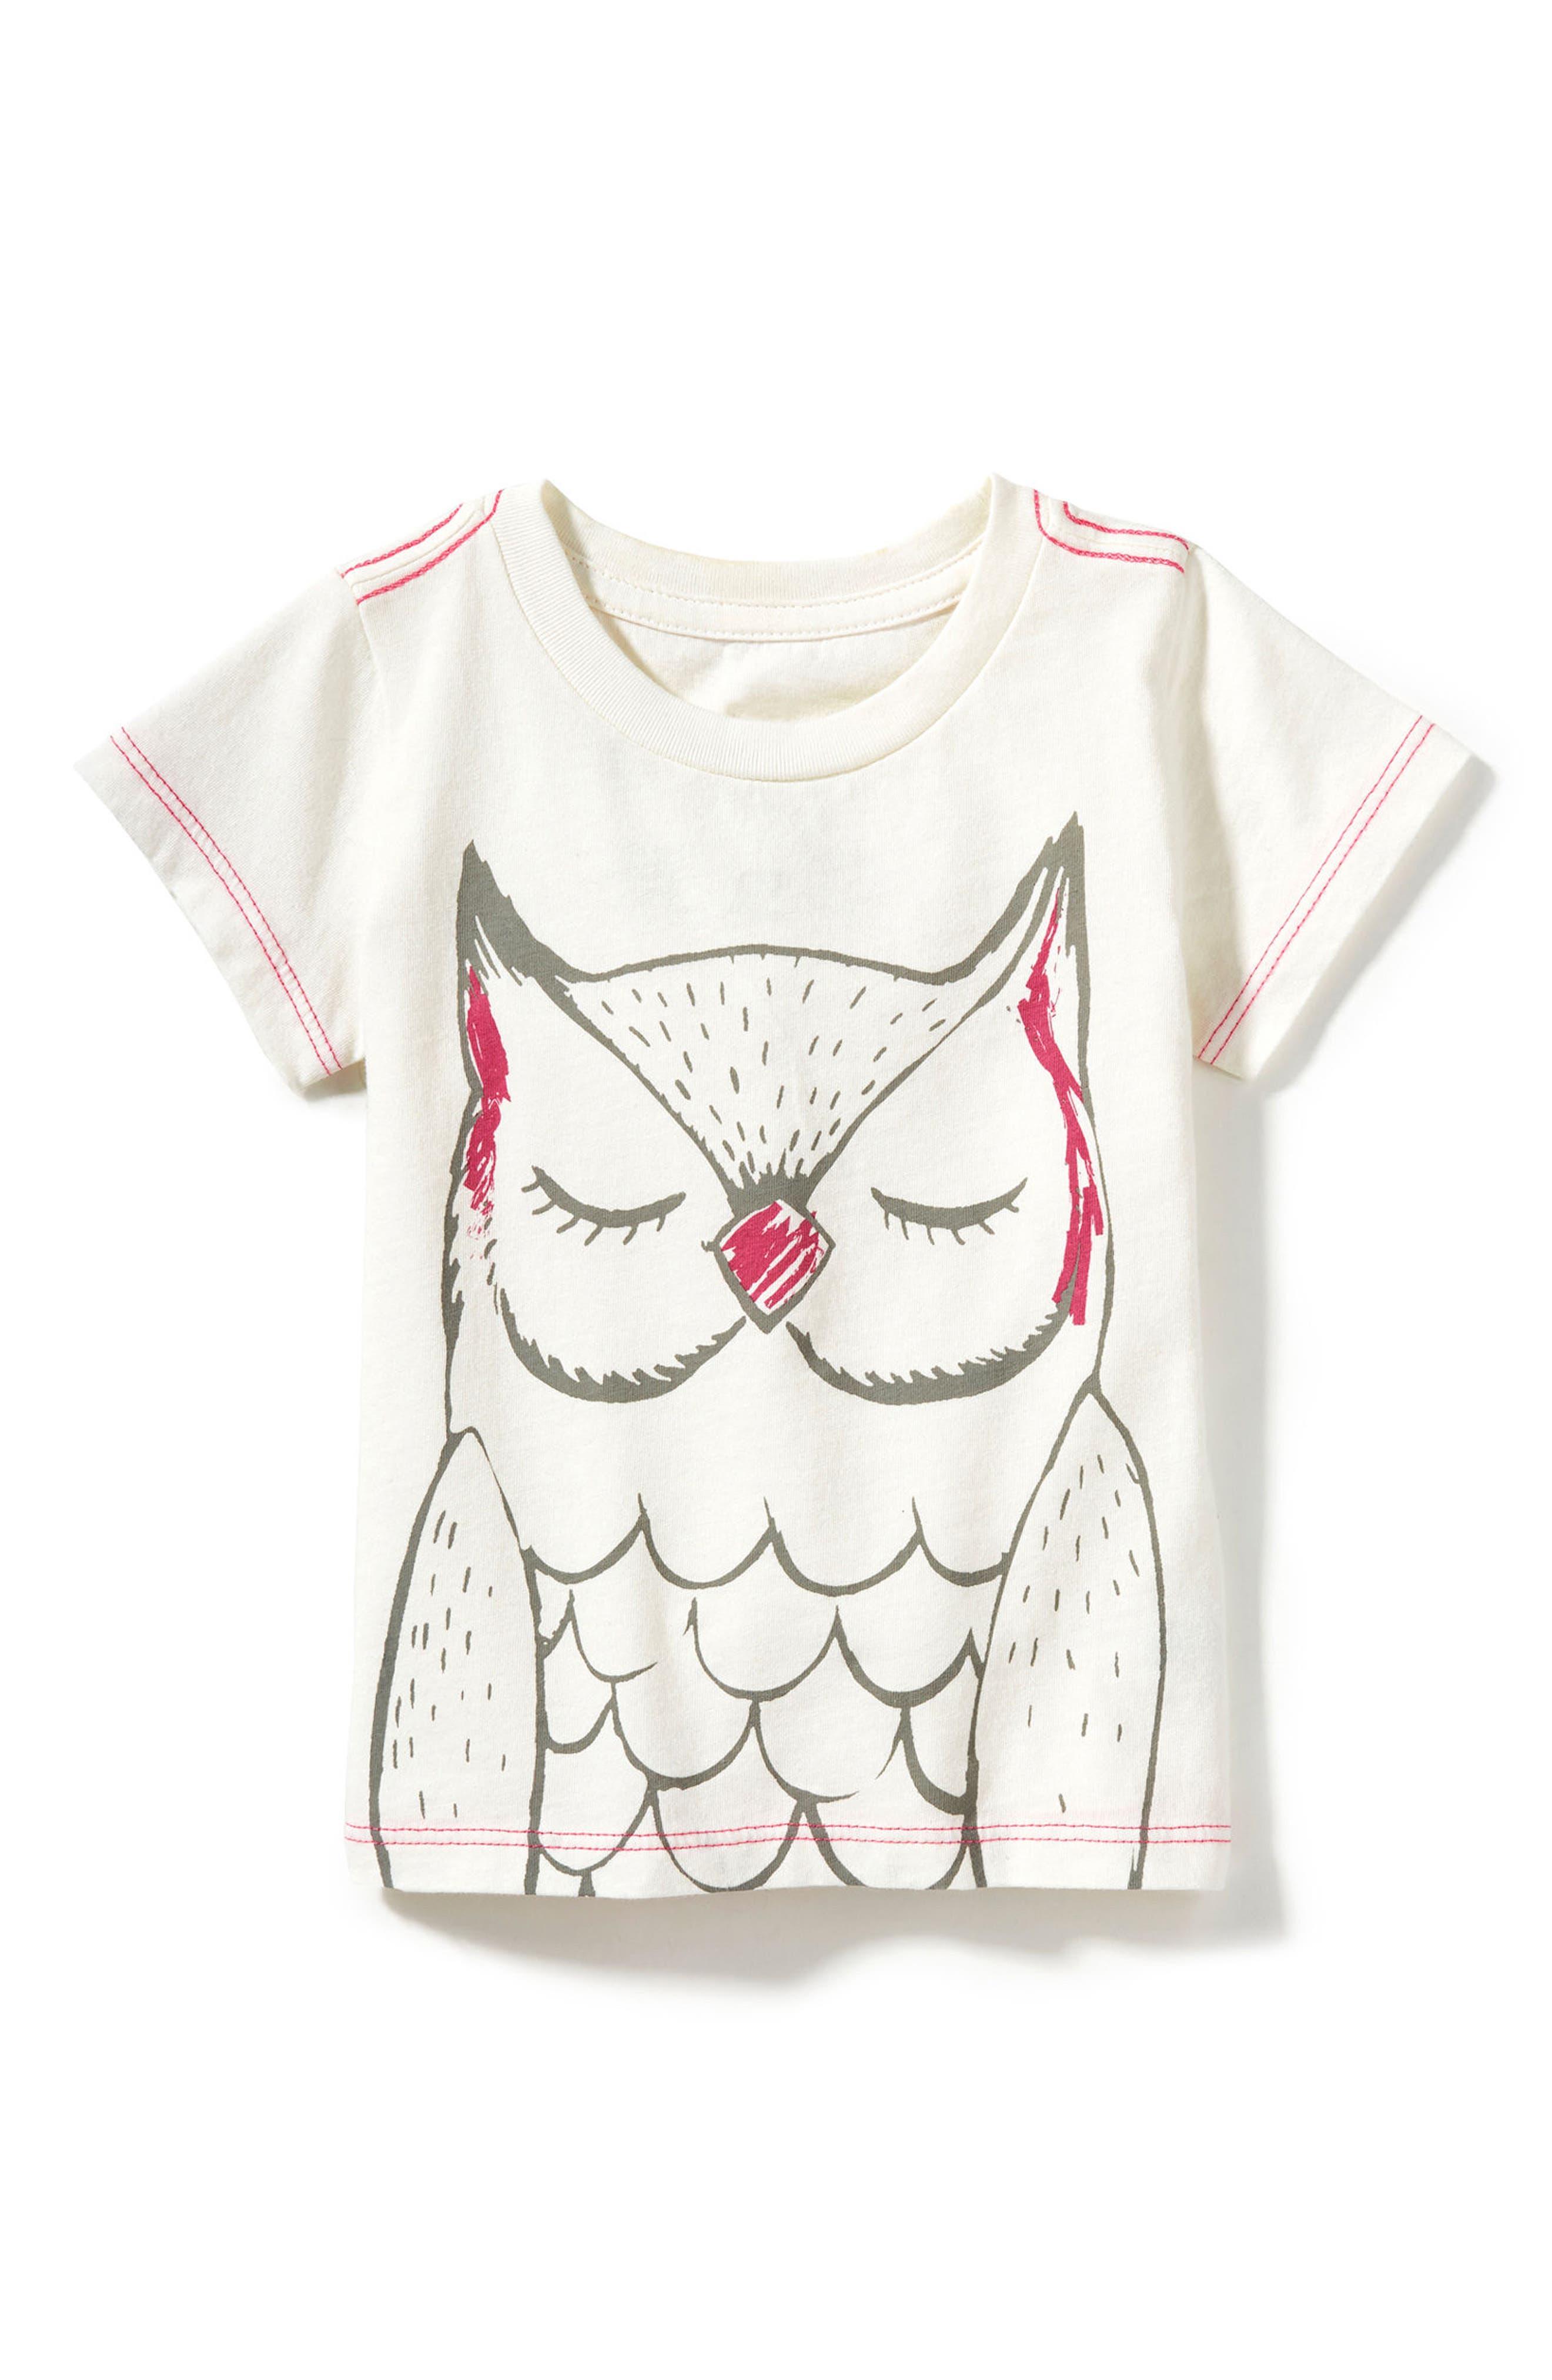 Alternate Image 1 Selected - Peek Owl Graphic Tee (Baby Girls)